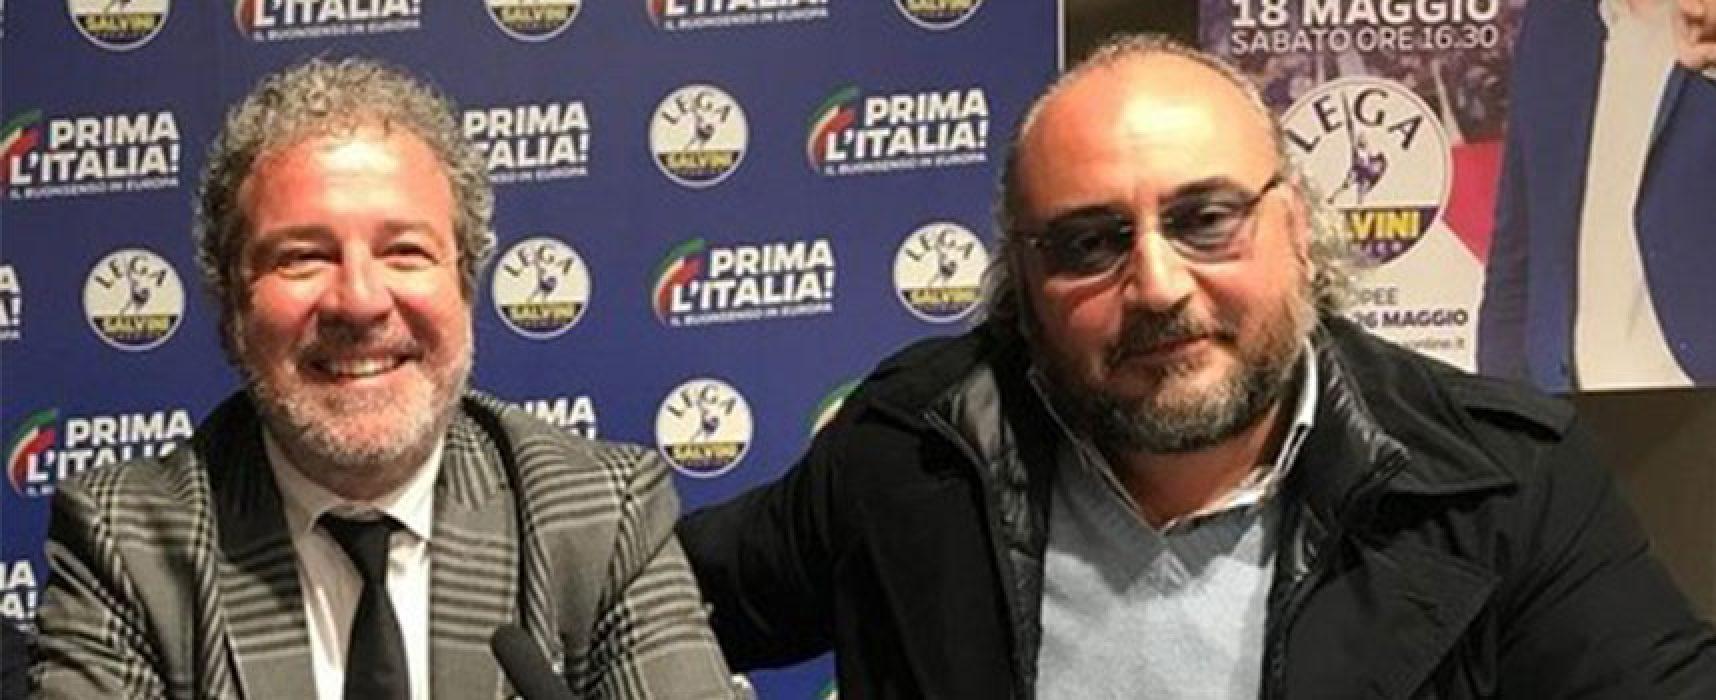 Raccolta firme della Lega Bat  in favore di Matteo Salvini